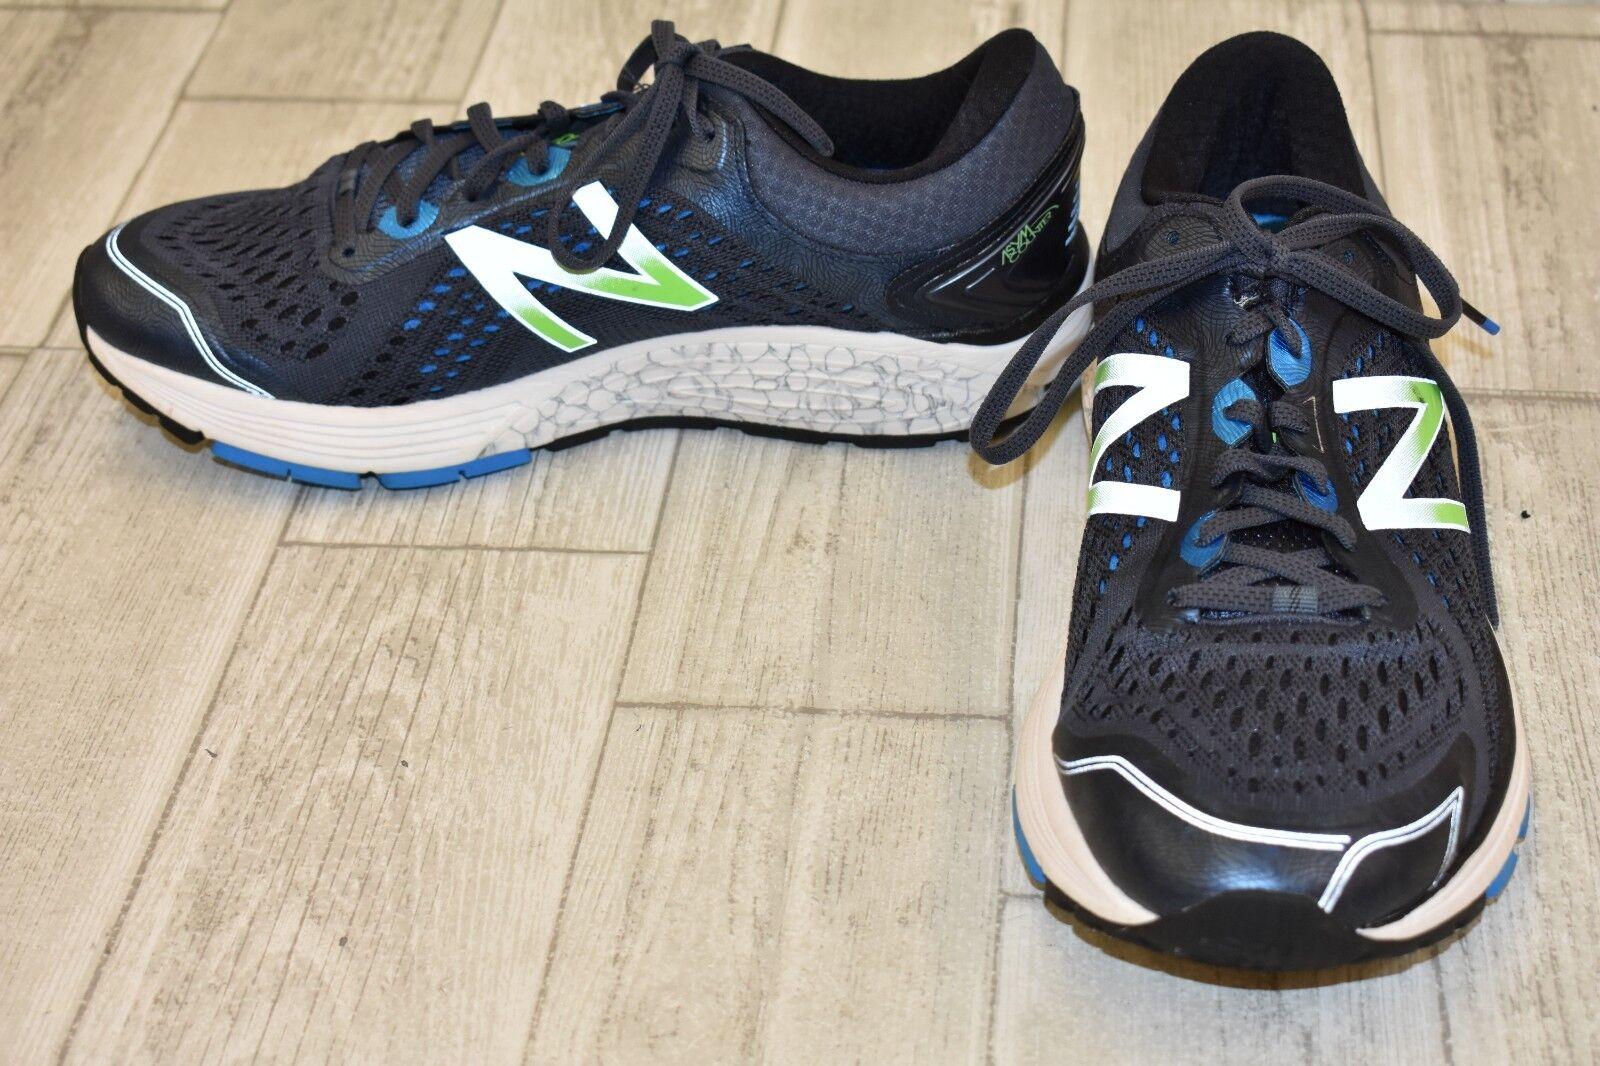 New Balance Balance New 1260 V7 Running Chaussures - Homme 9c730e